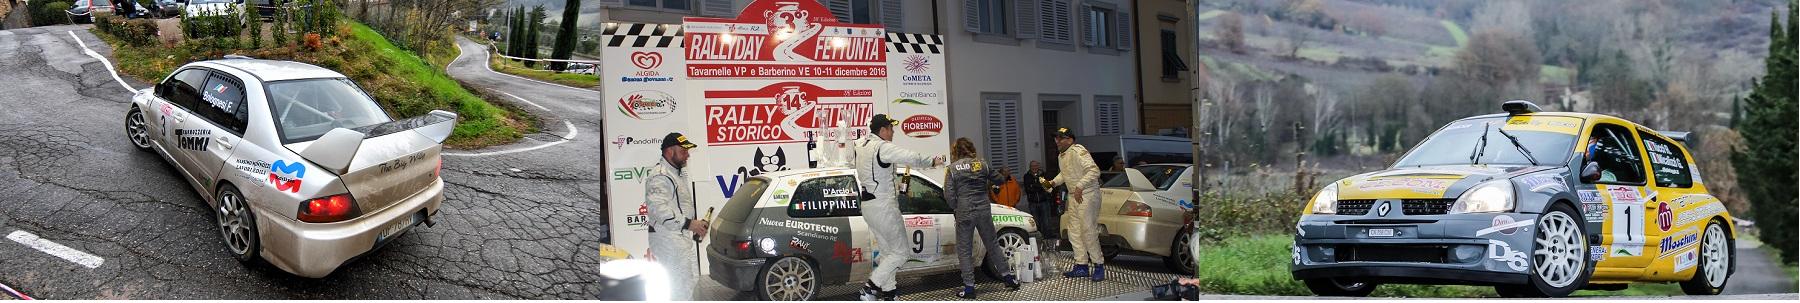 40° Rally della Fettunta